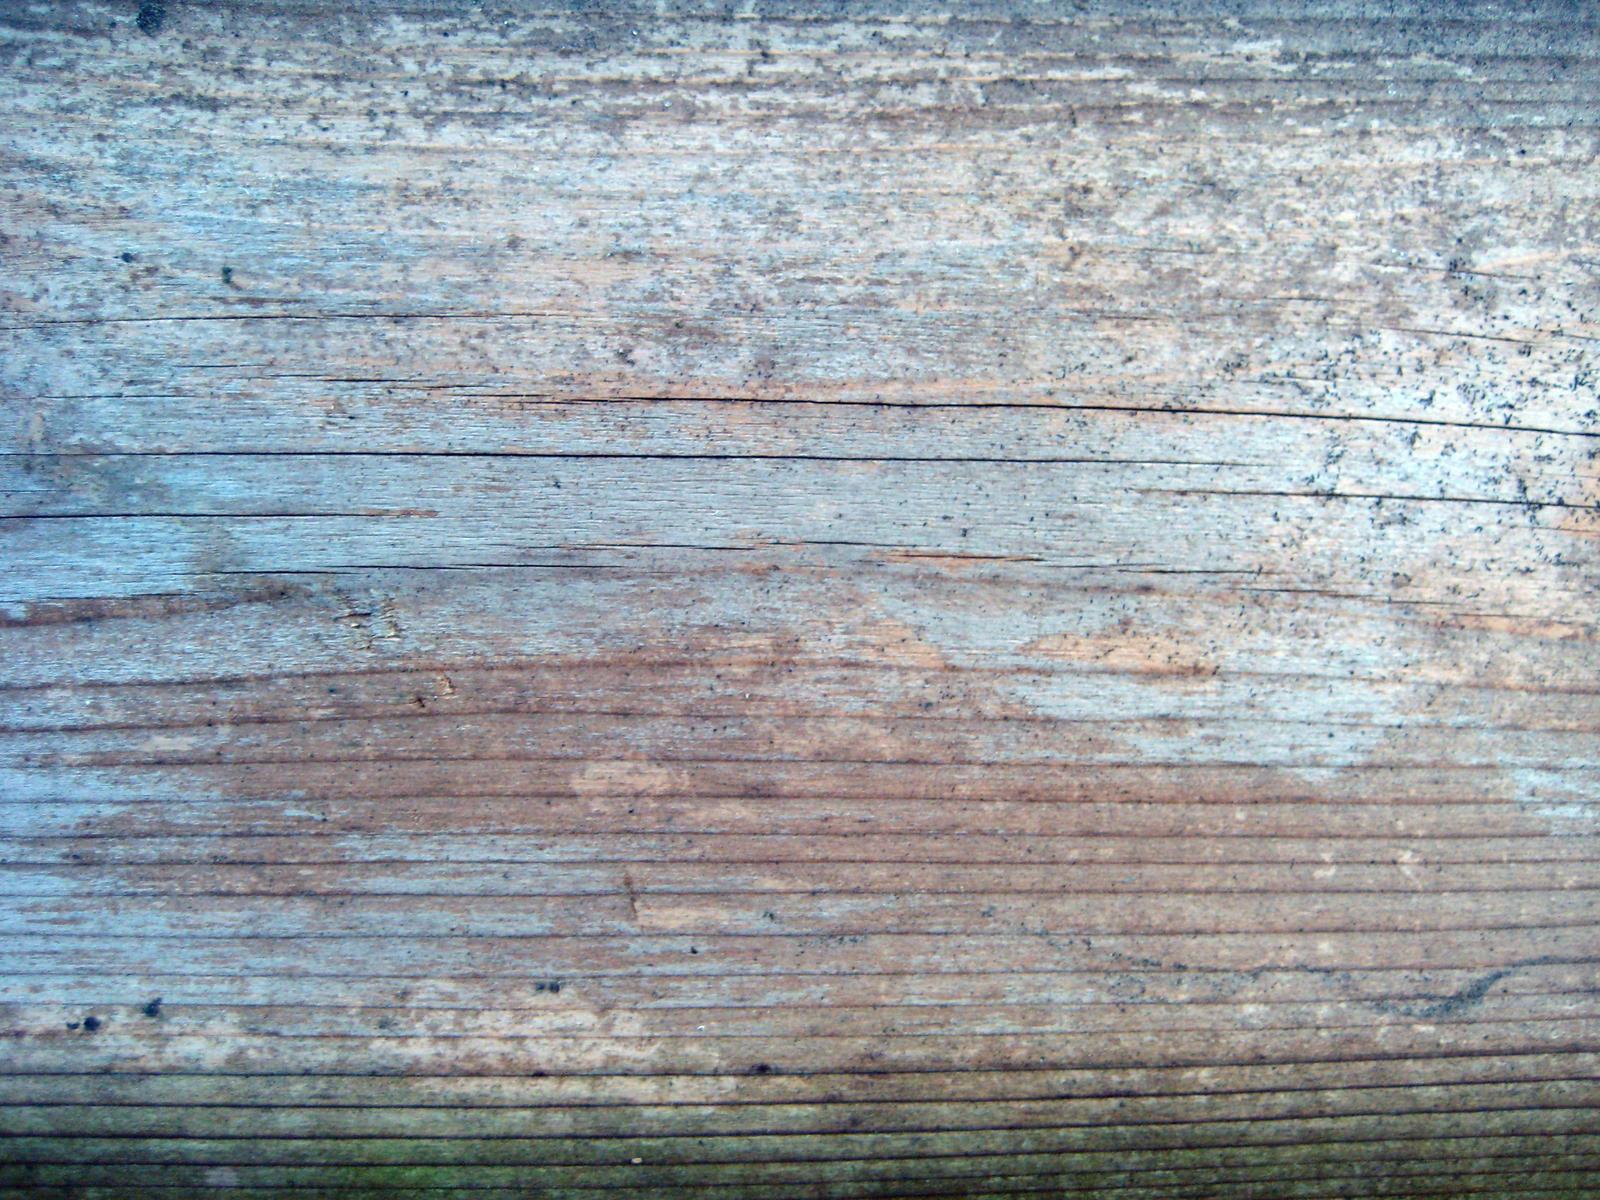 Old Wood Texture by bozoartist on DeviantArt